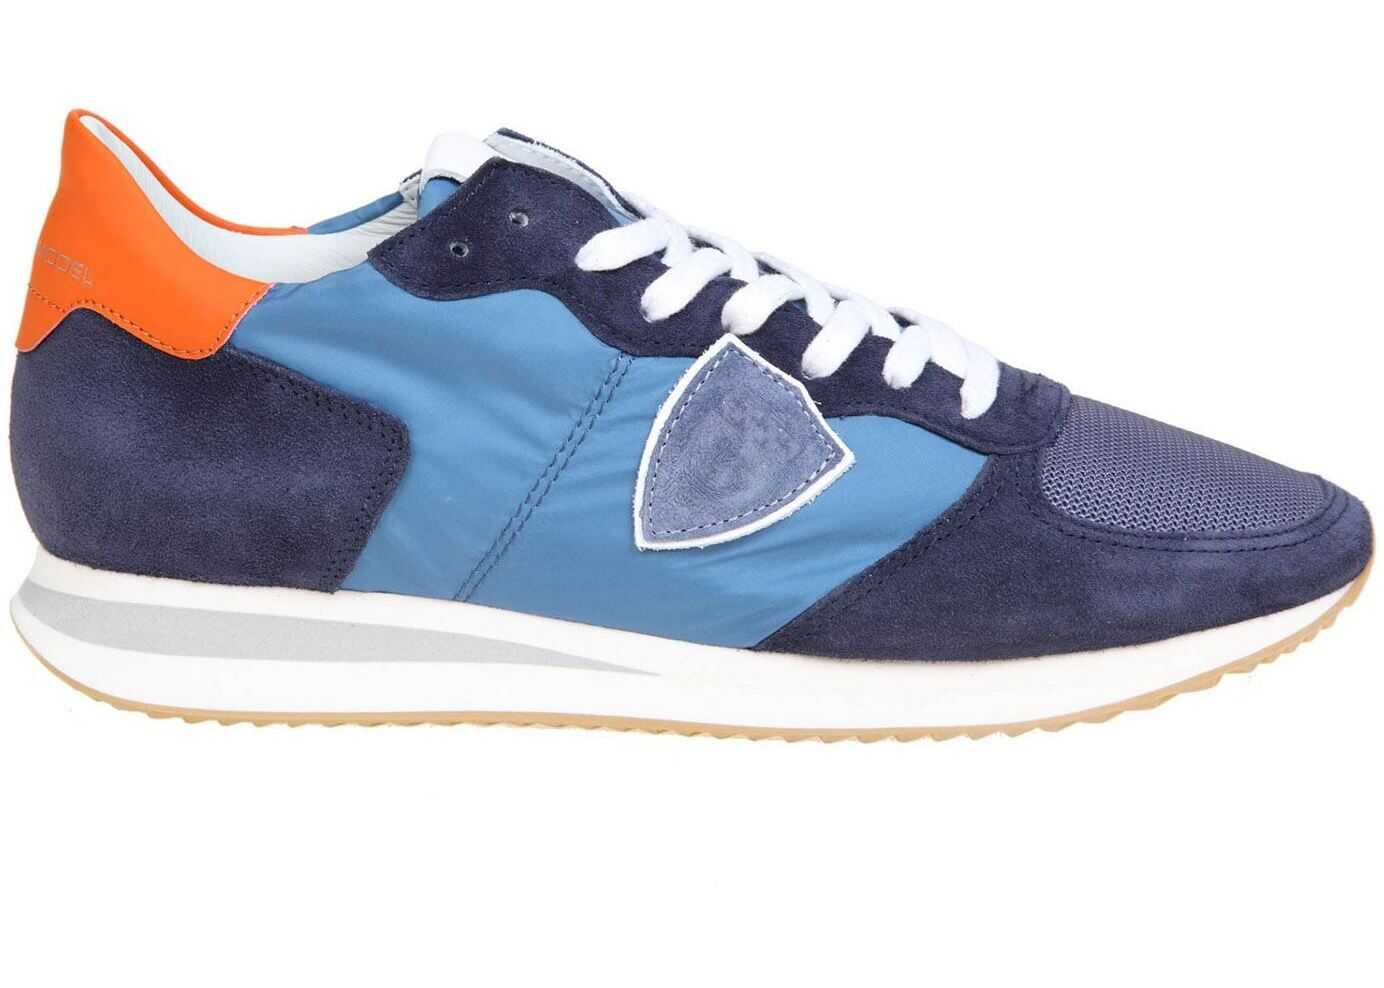 Philippe Model Blue Trpx Sneakers With Orange Heel Tab TZLU W055 Blue imagine b-mall.ro